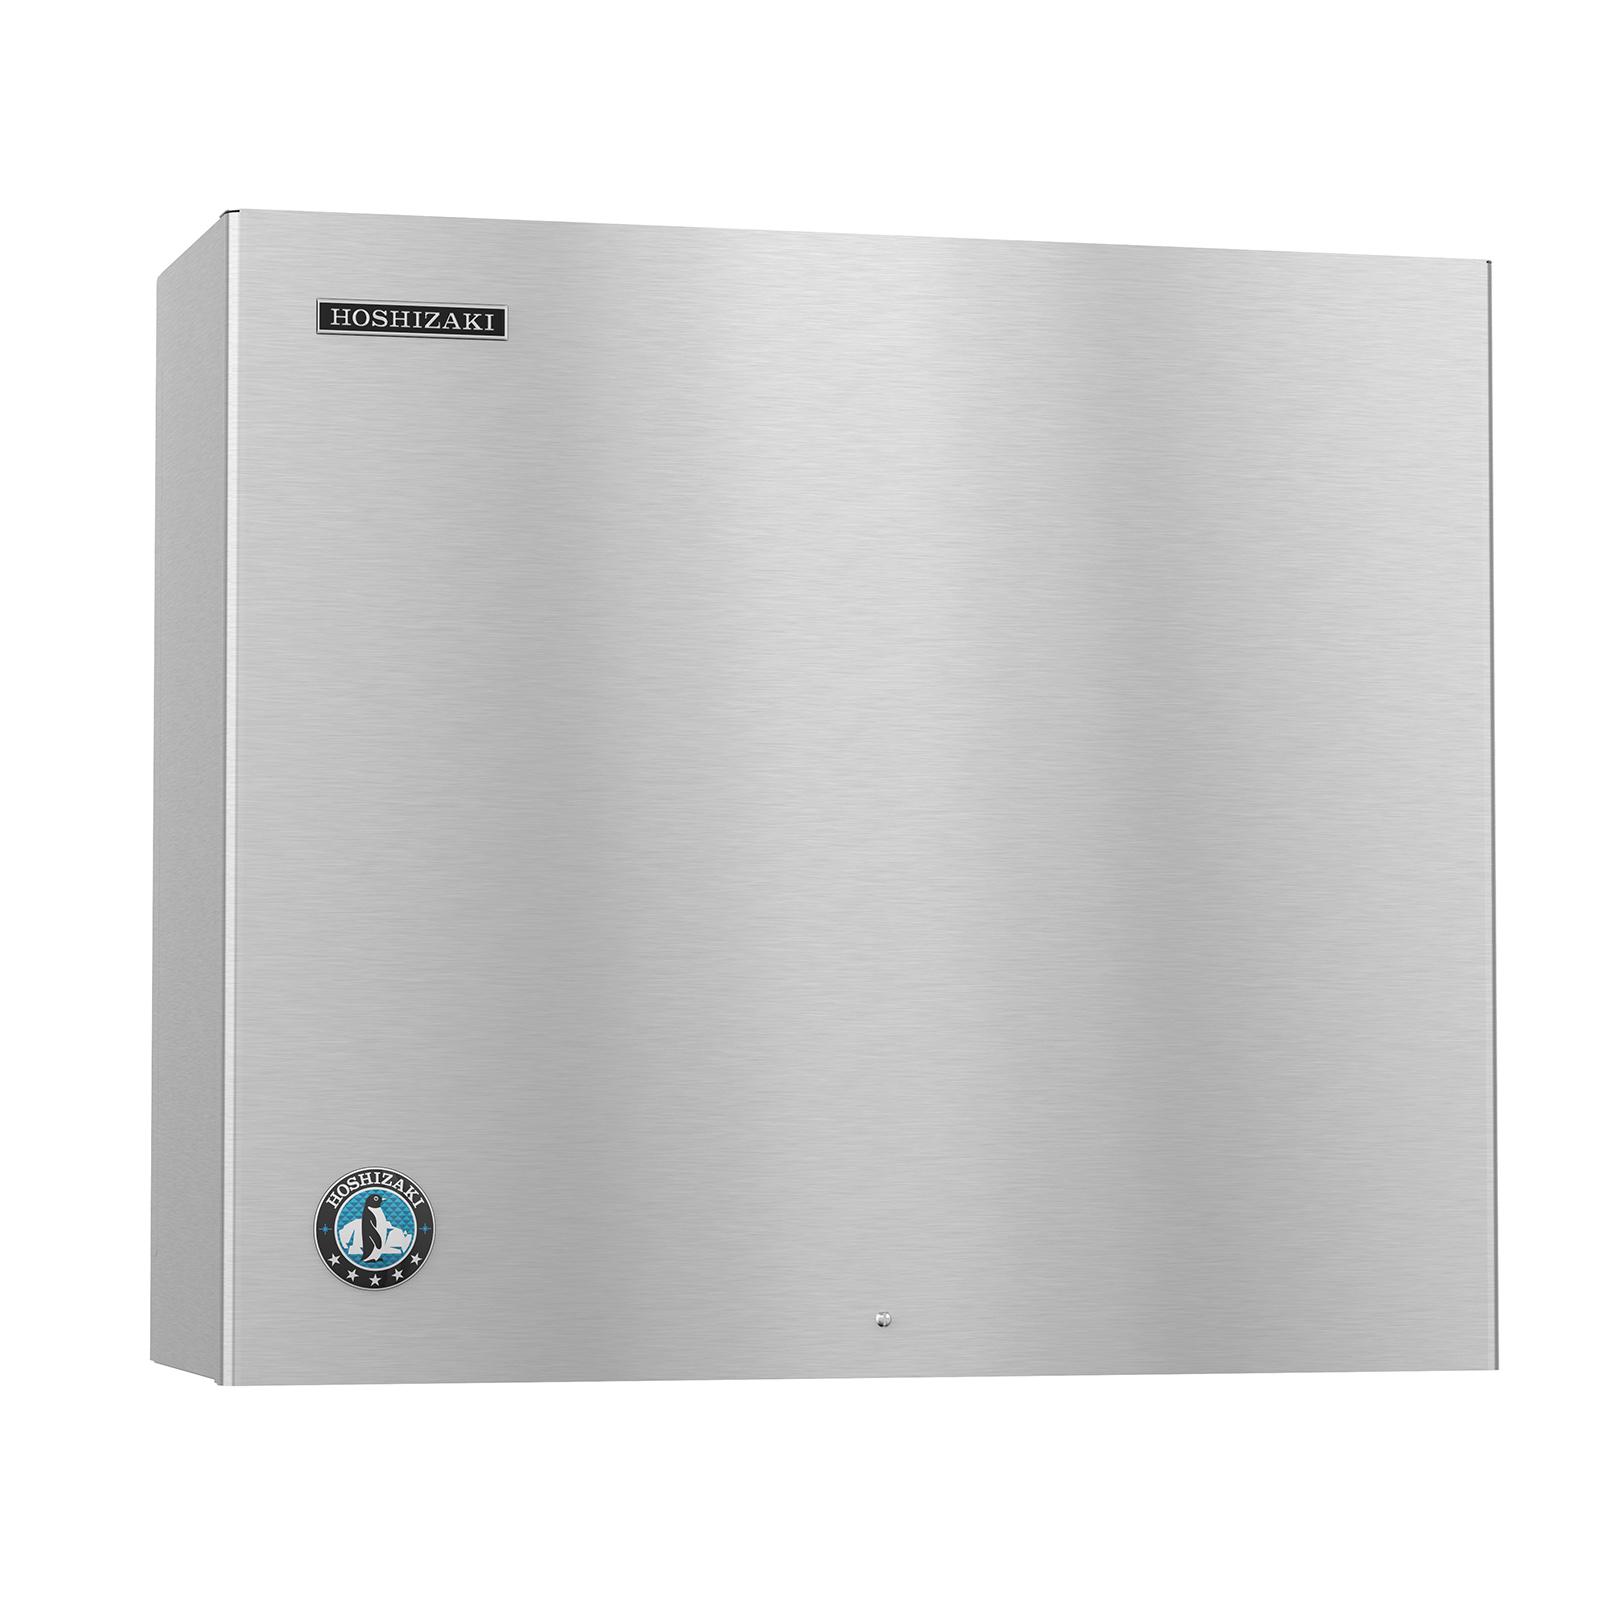 Hoshizaki FS-1001MLJ-C ice cubers, ice storage & ice dispensers